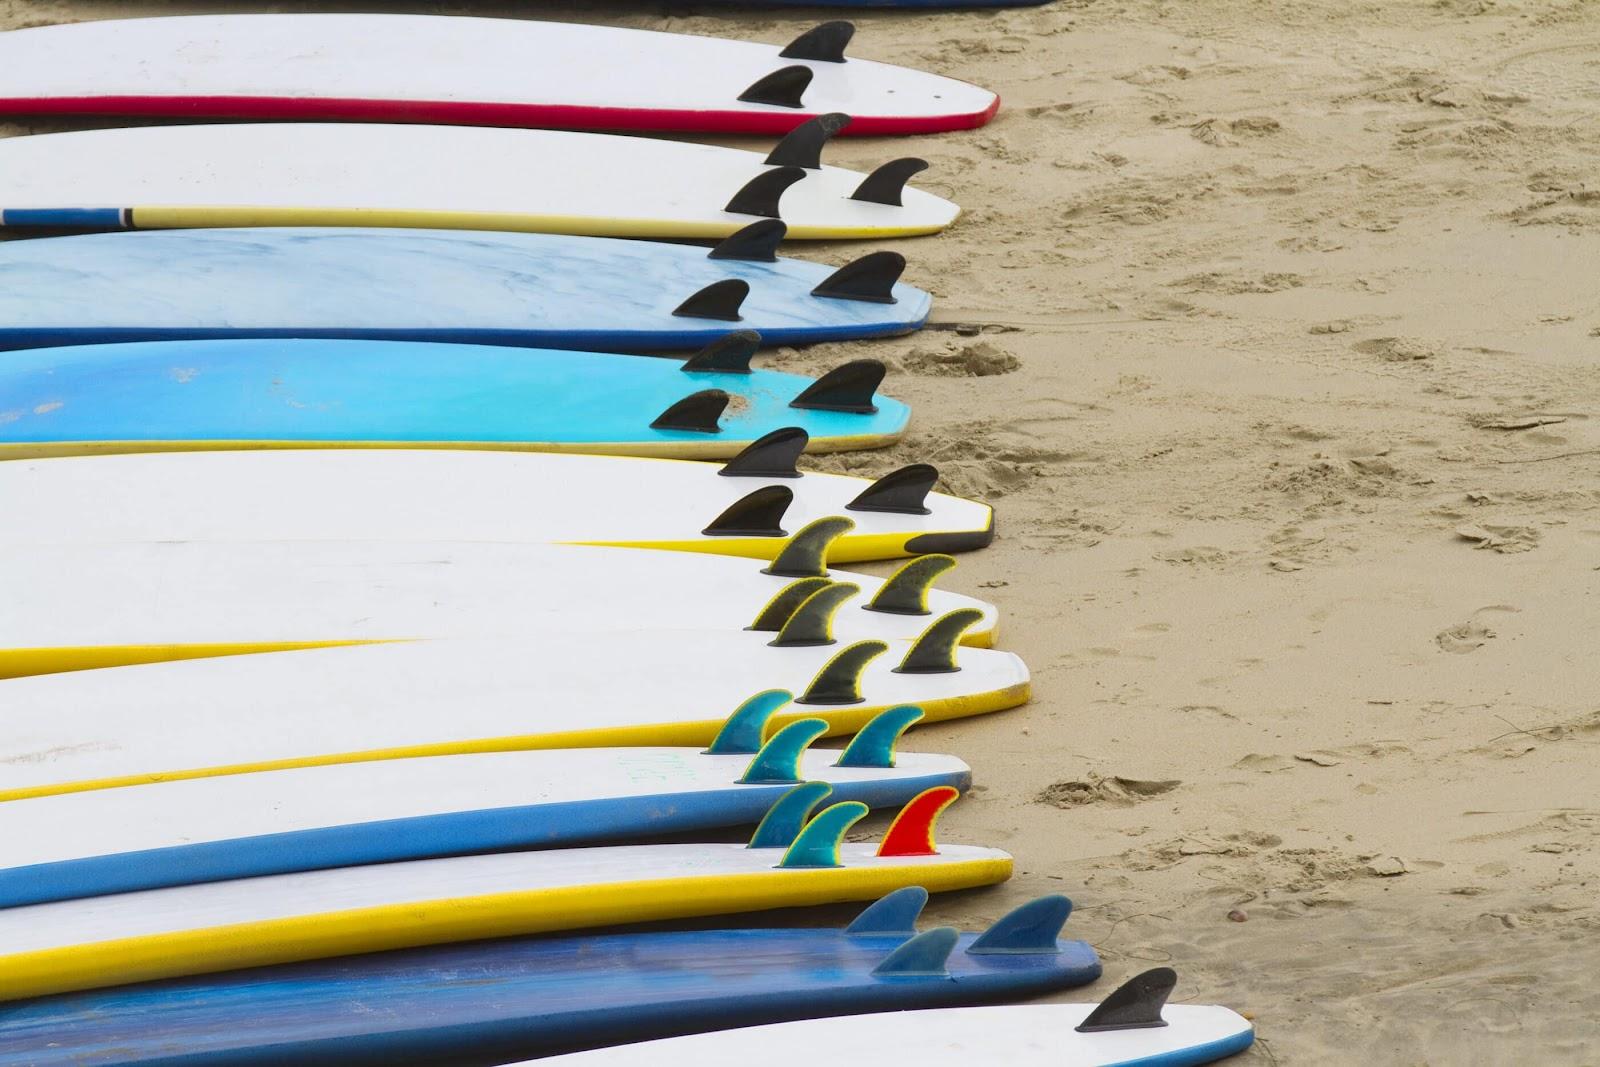 7 San Diego Surf Schools for Lessons, Camps, & Rentals — La Jolla Mom